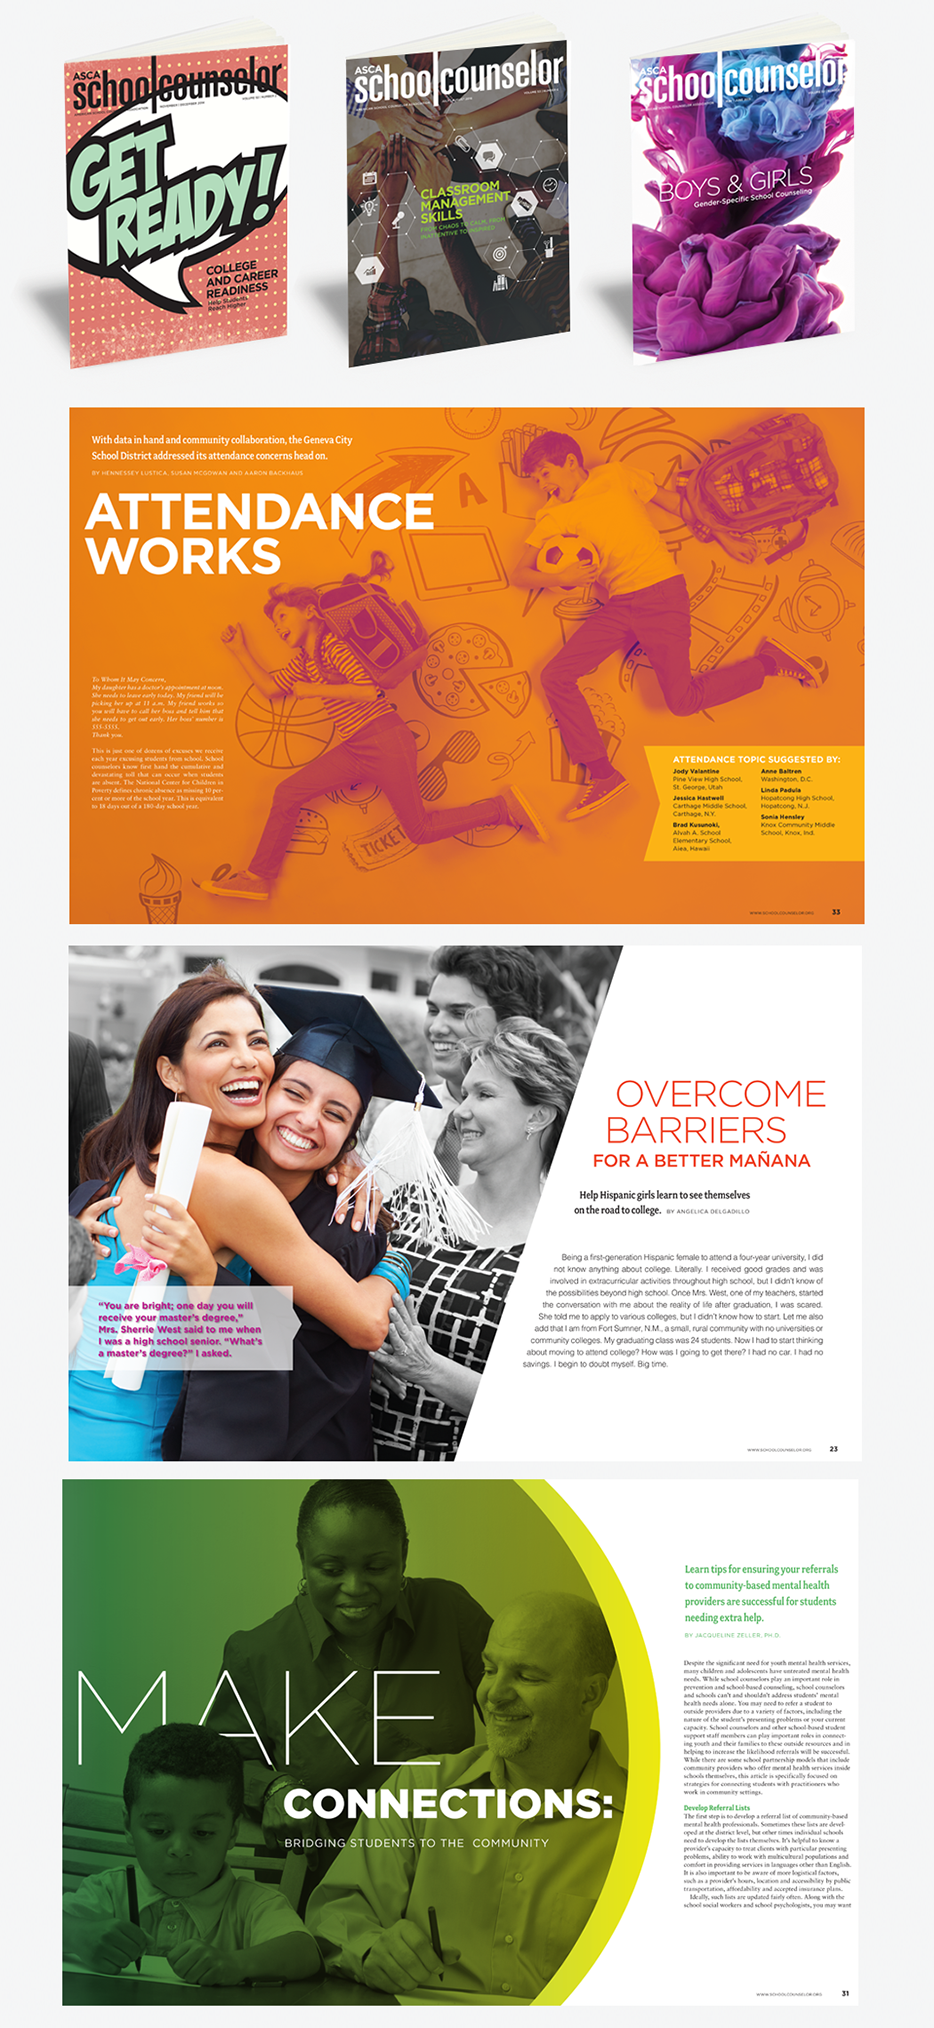 ASCA School Counselor Magazine